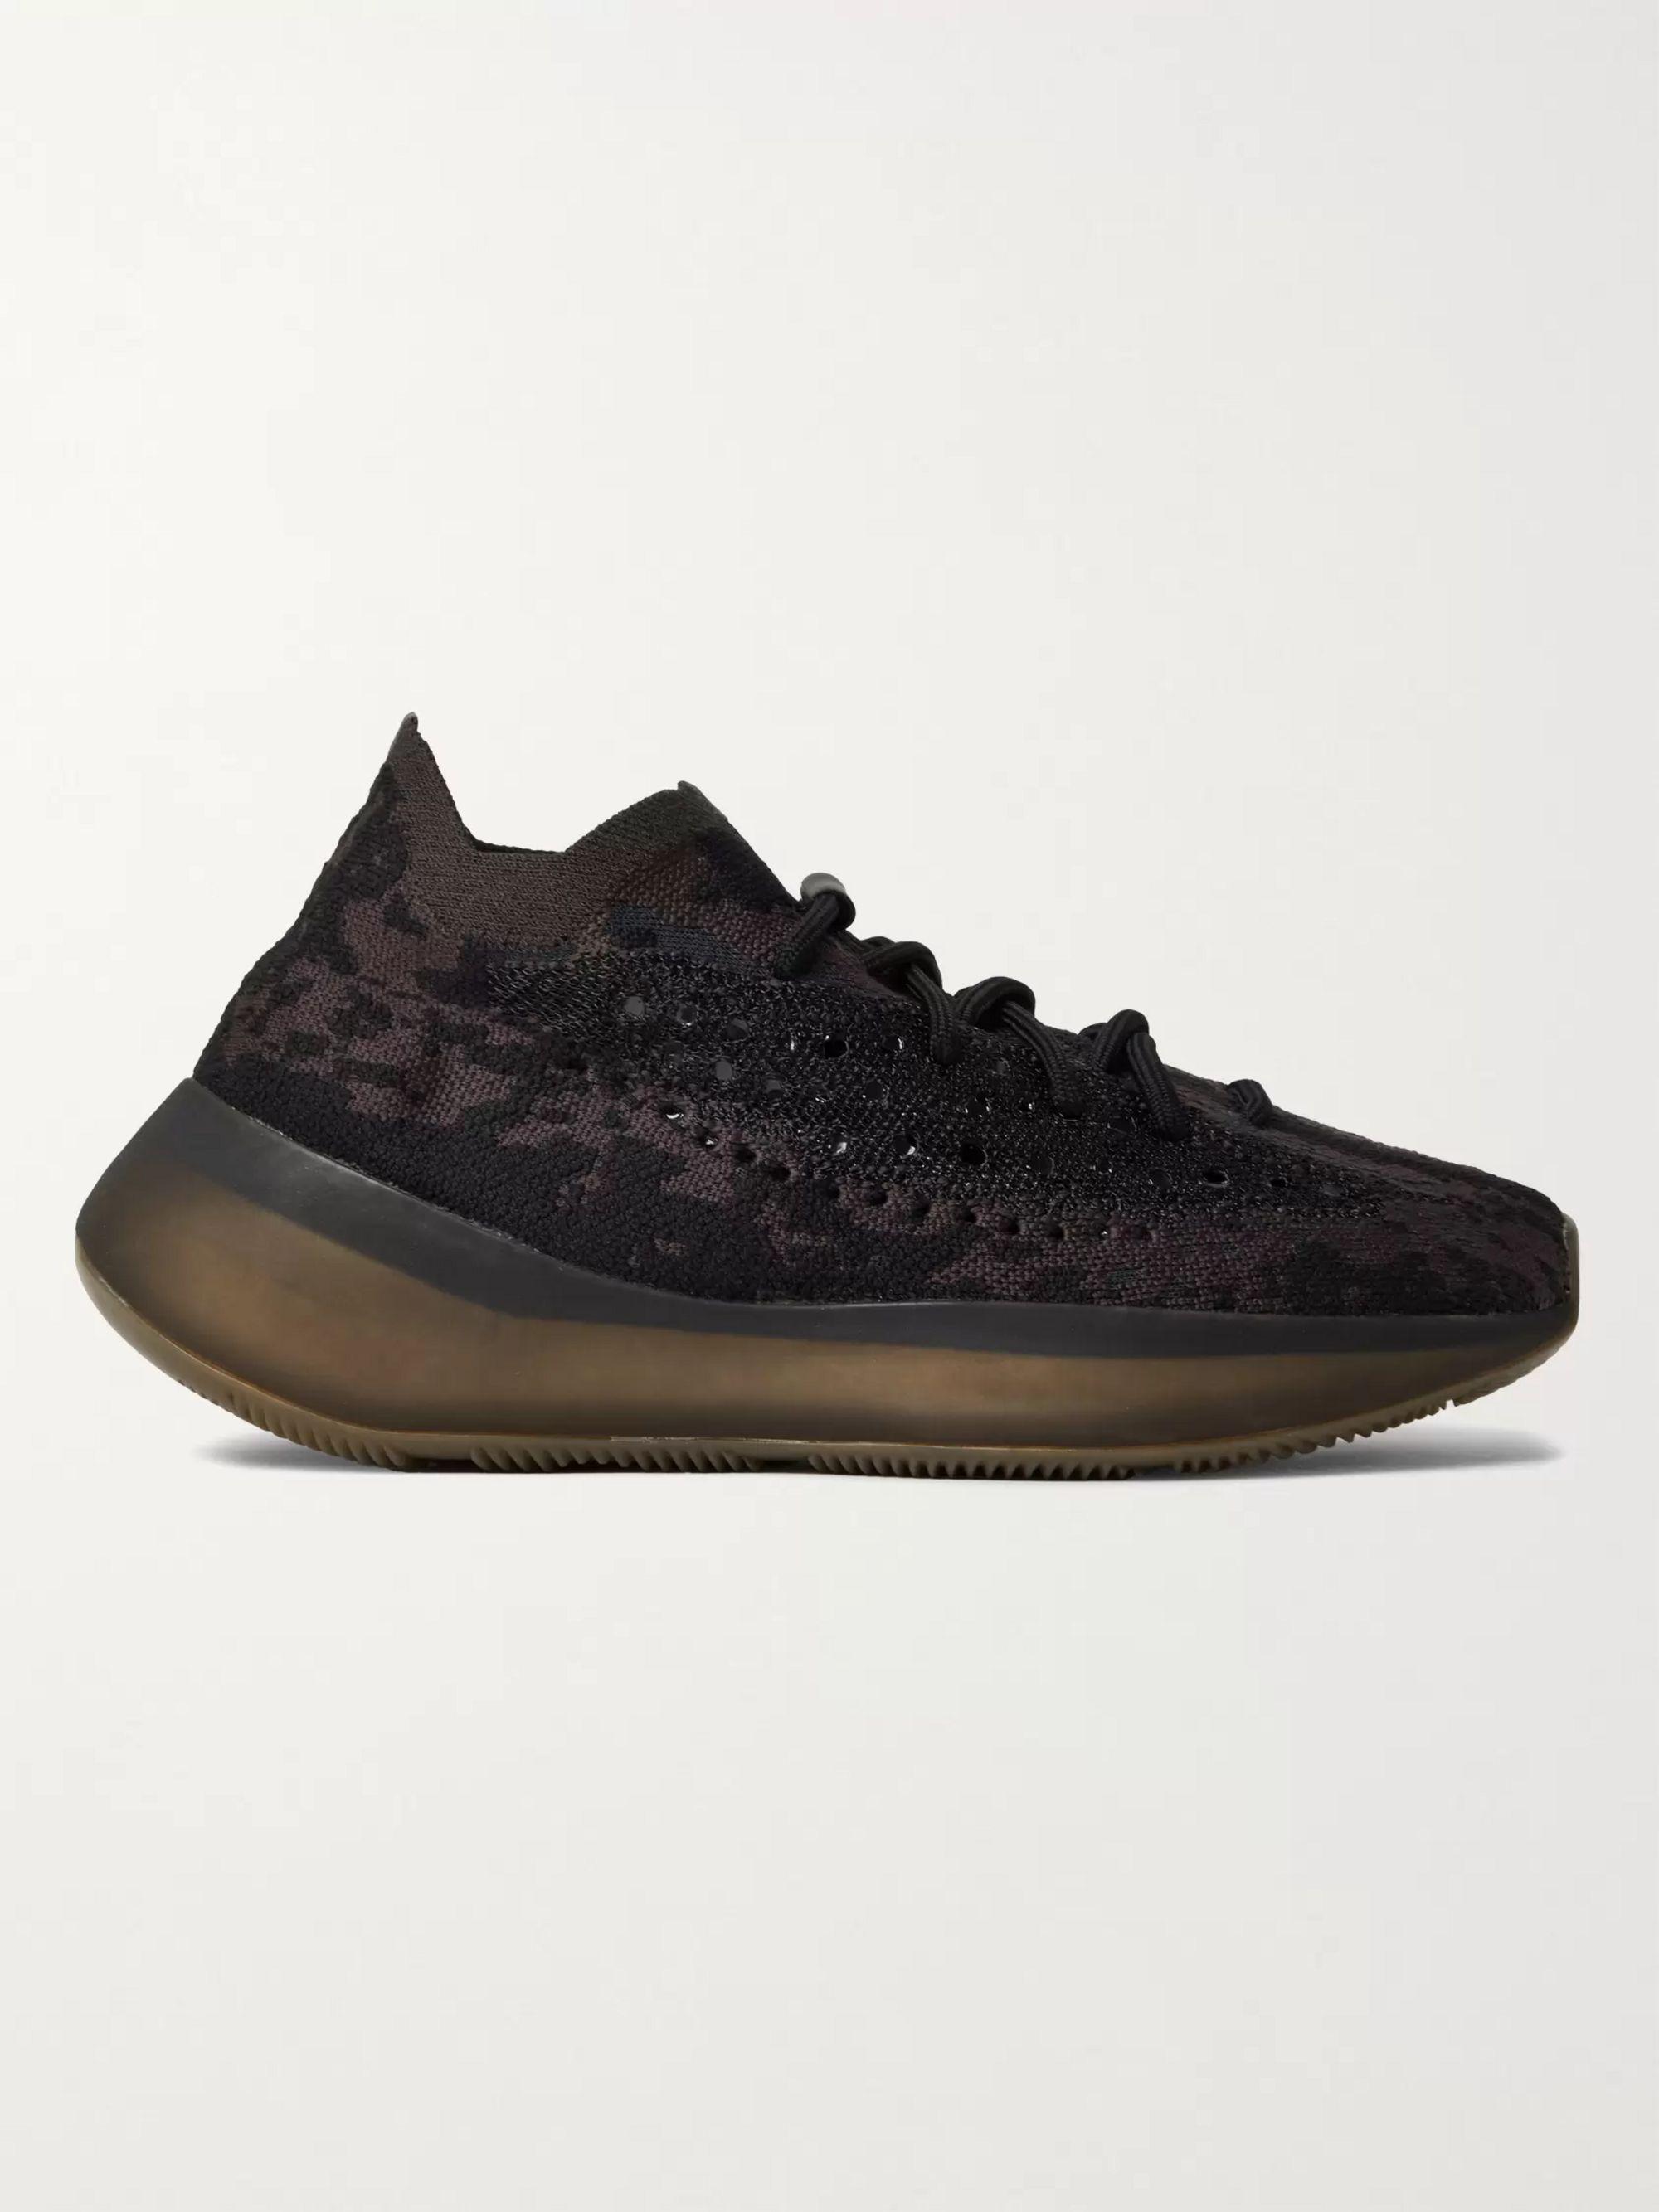 Black Yeezy Boost 380 Primeknit Sneakers Adidas Originals Mr Porter